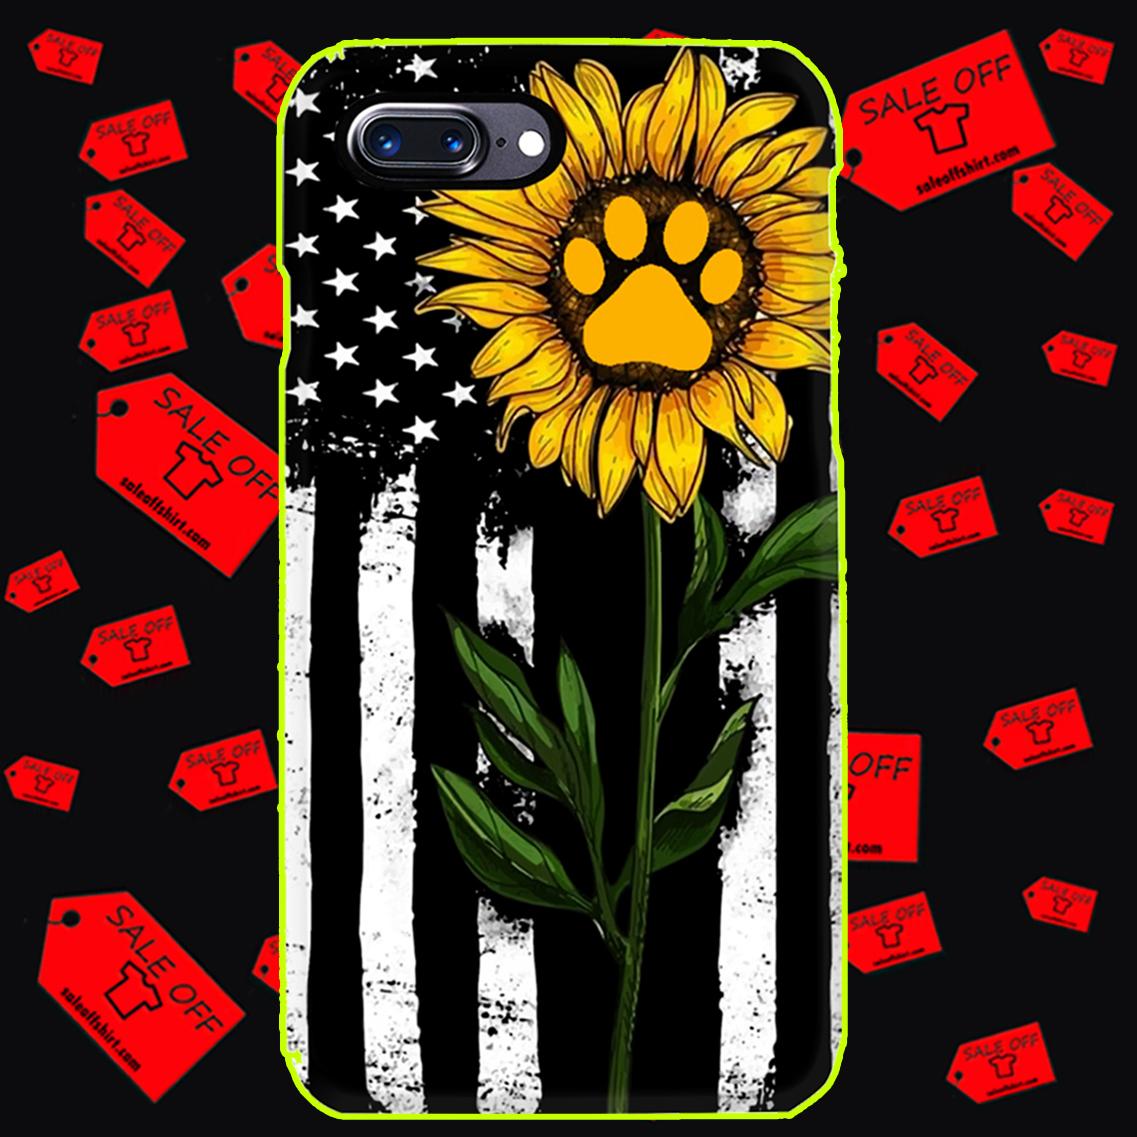 Sunflower American flag paw phone case - iphone 7 plus case